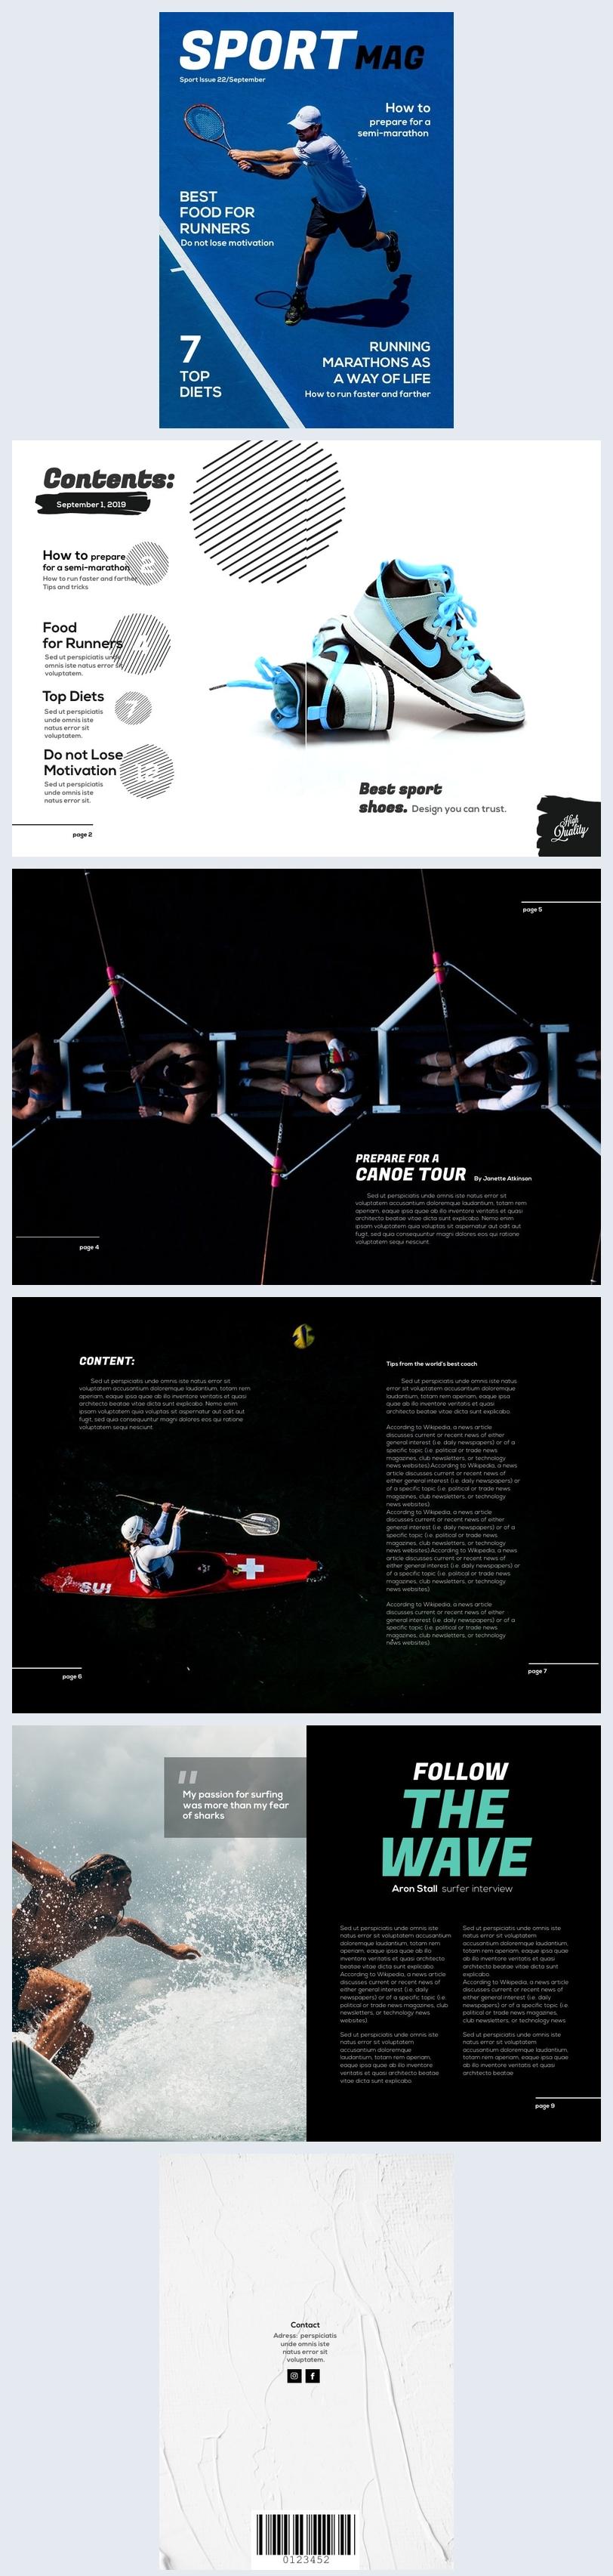 Design de Revista de Esportes